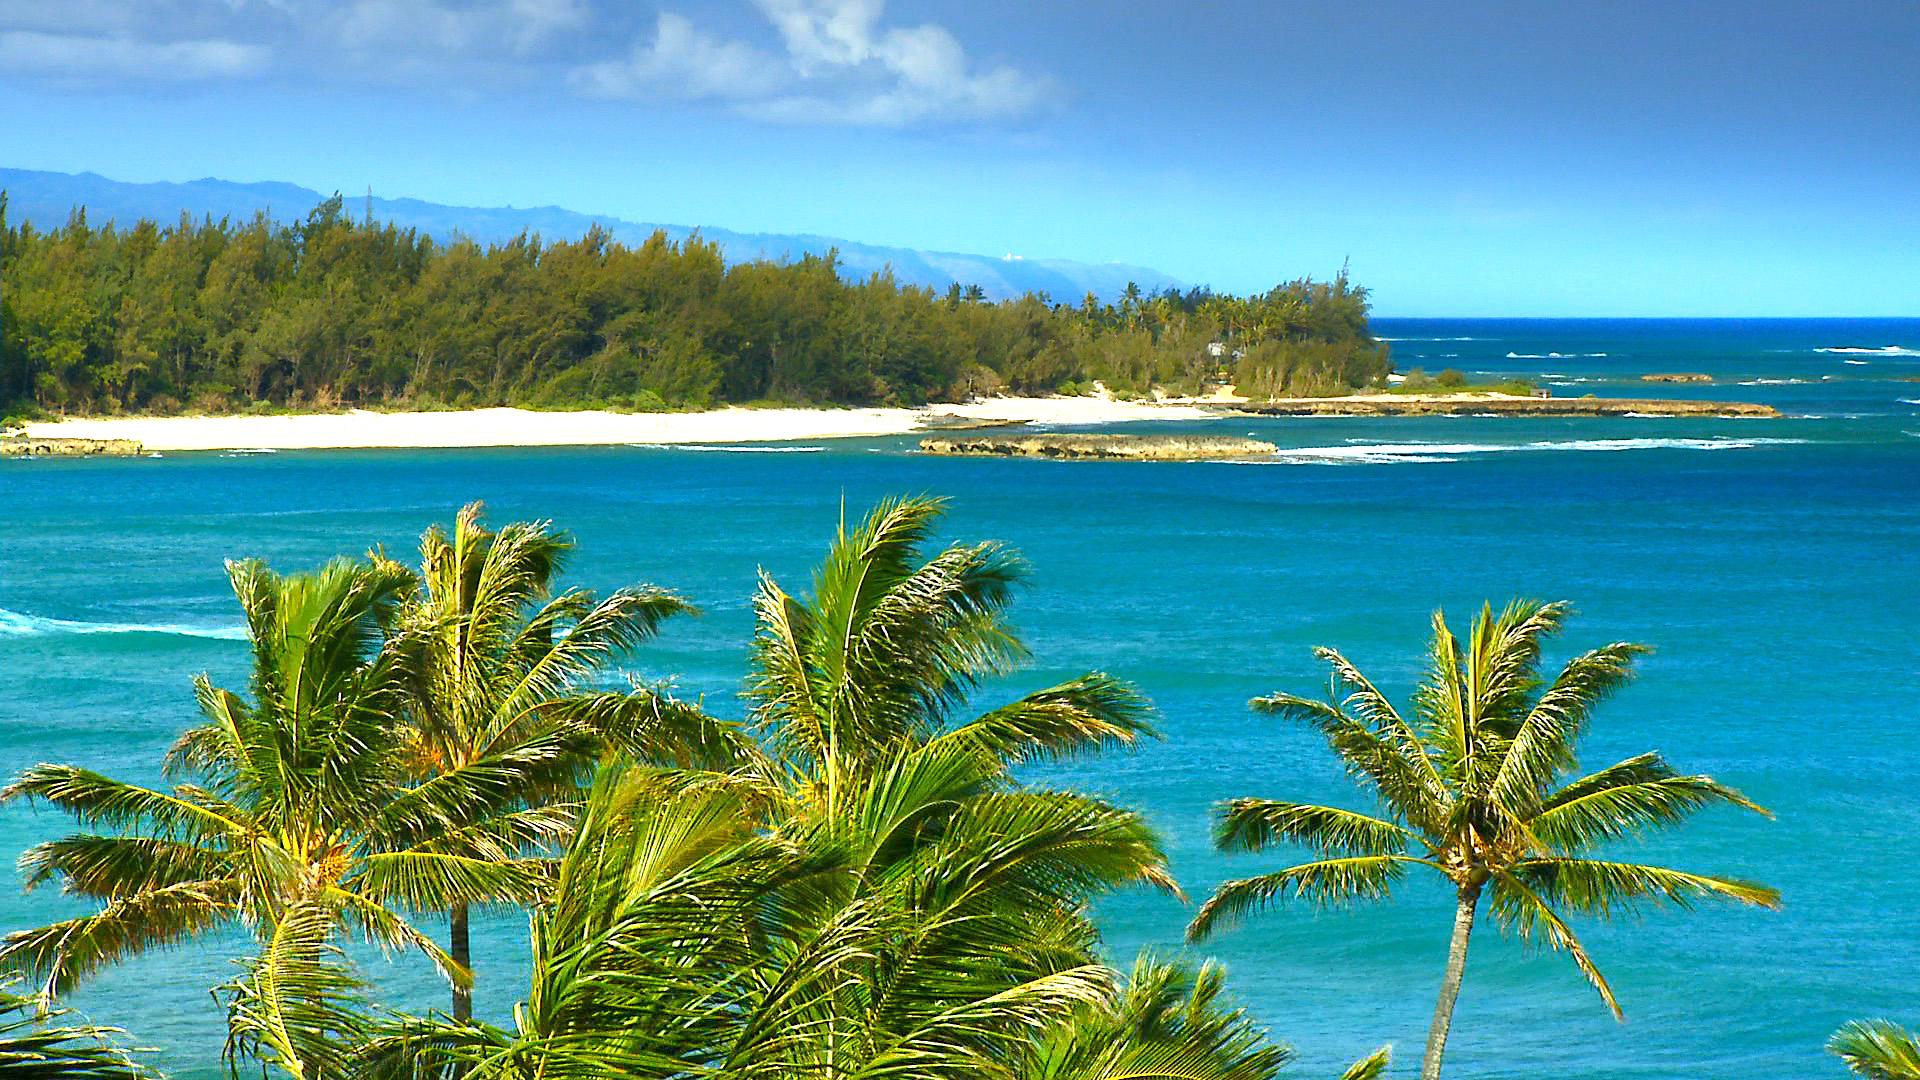 Hawaii Beaches wallpaper - 11142